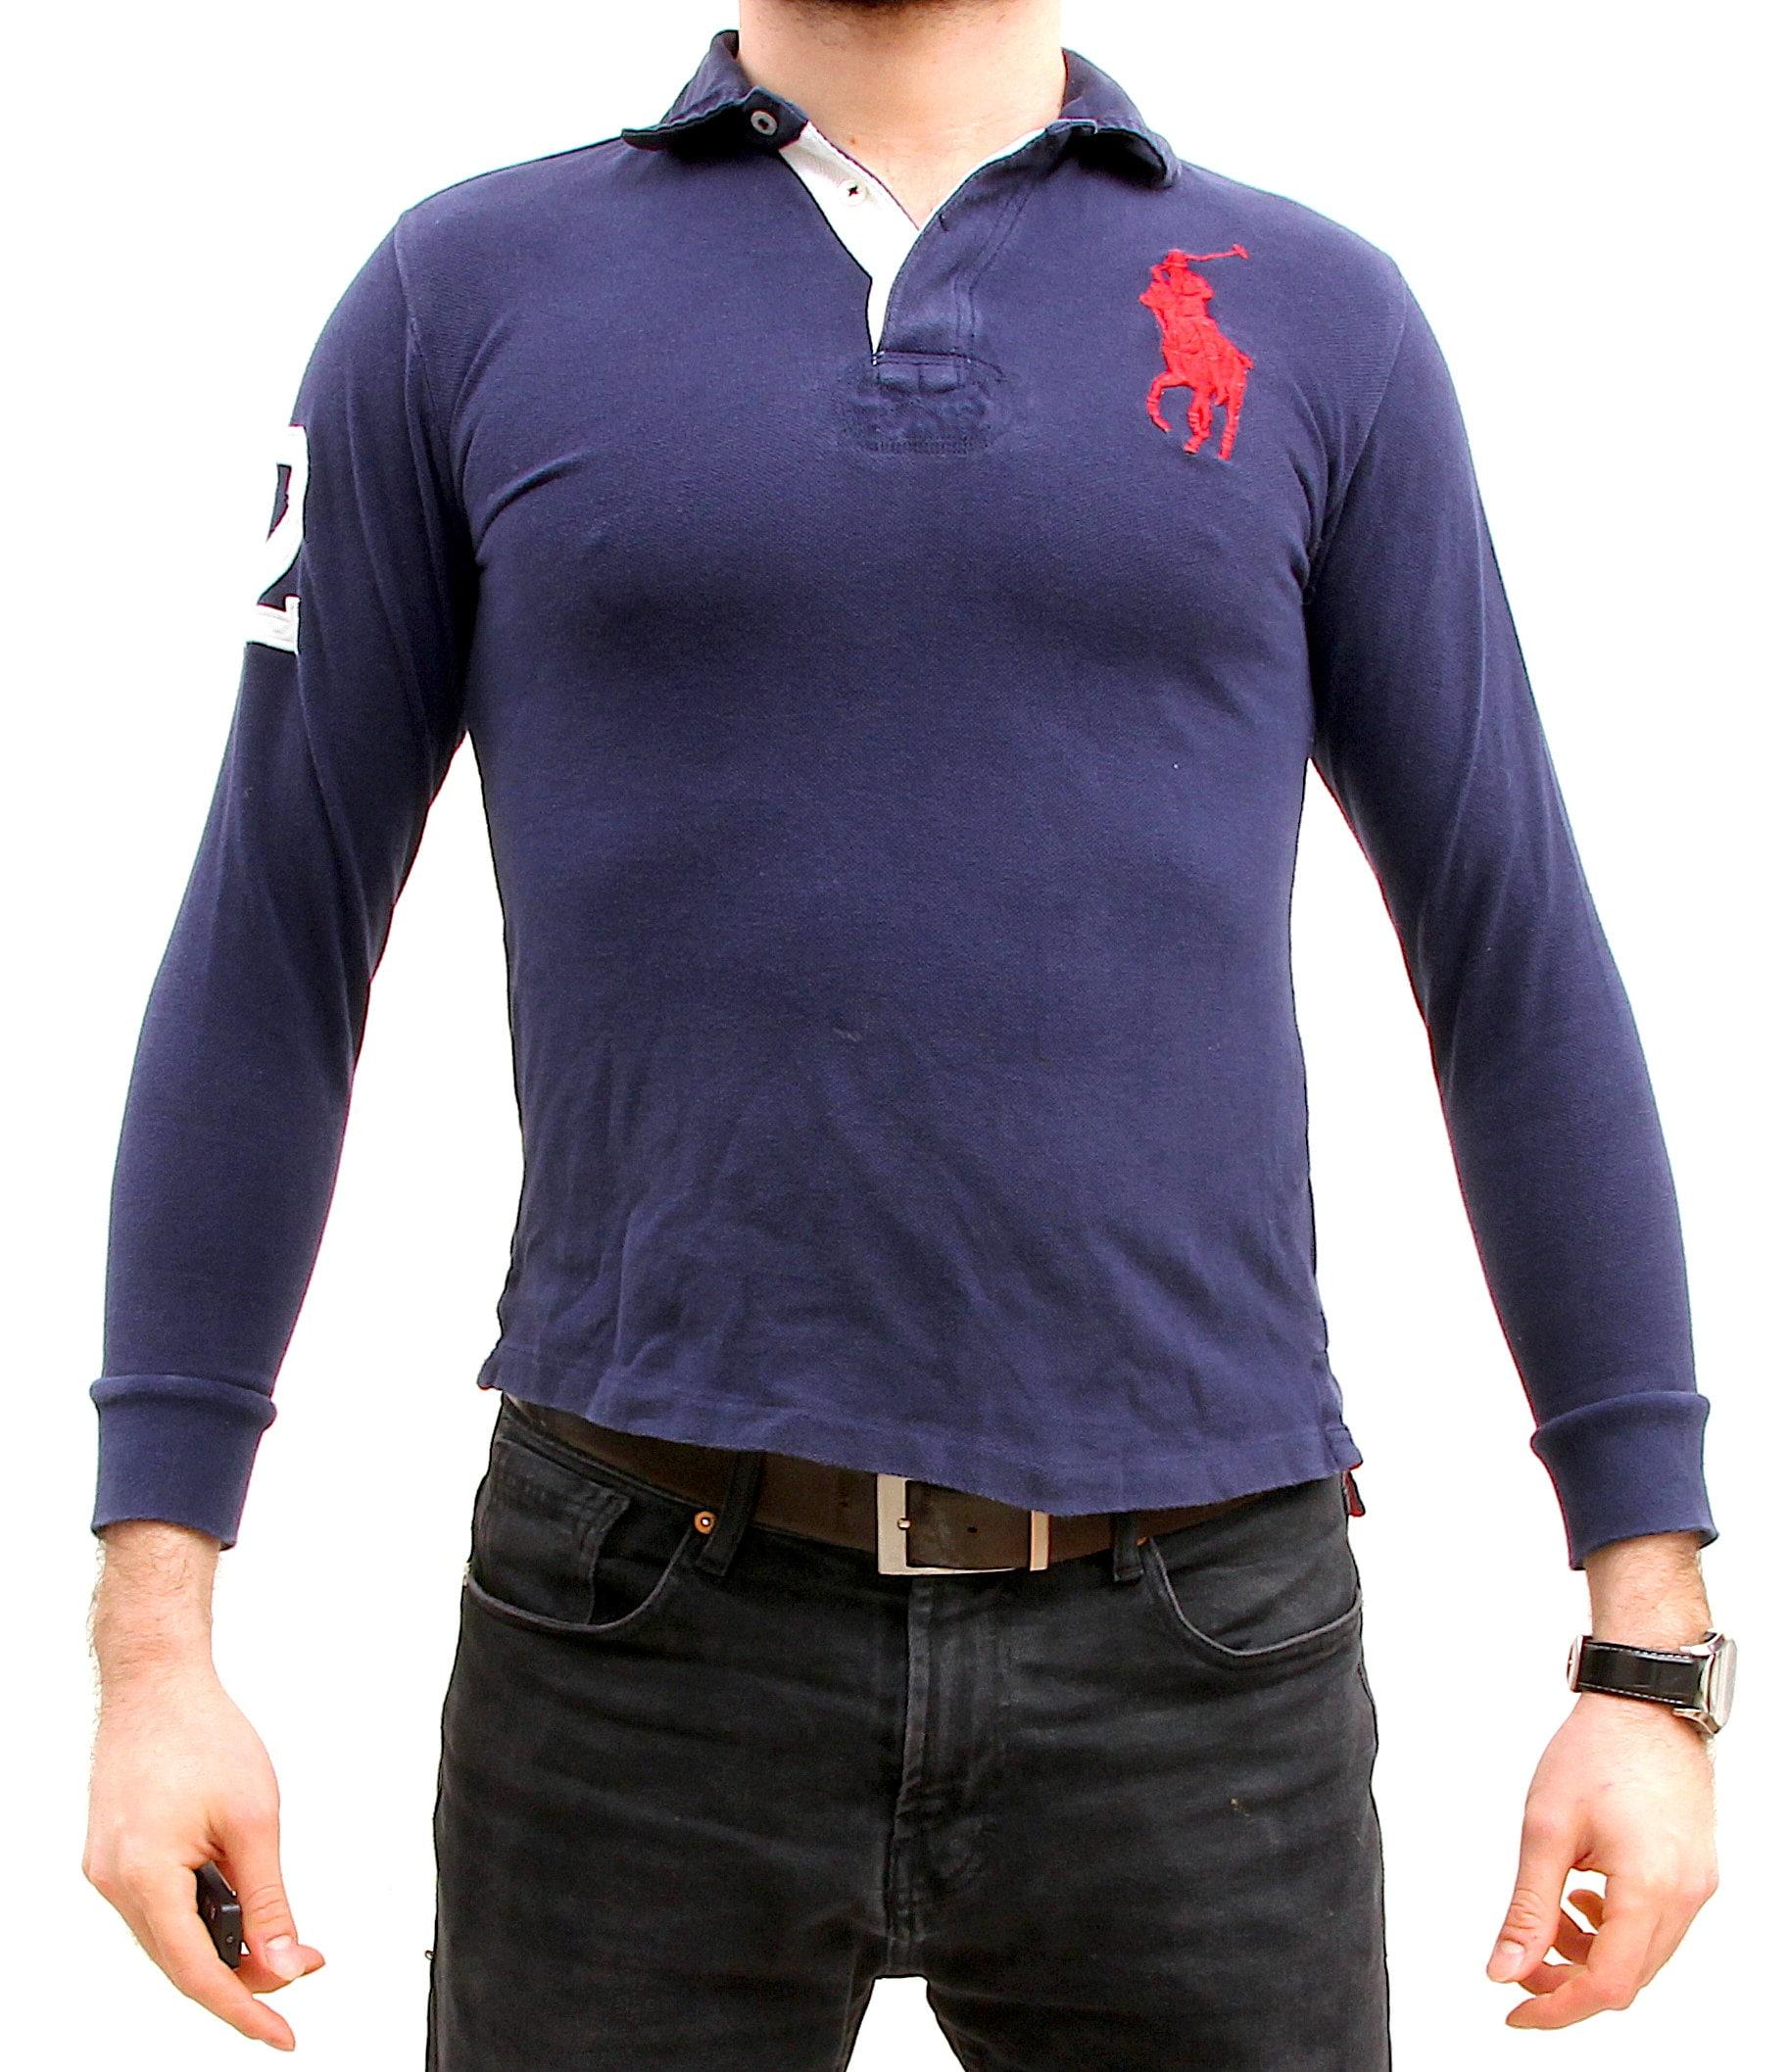 Ralph Lauren Button Up Golf Polo Preppy Horse Riding Sports Sweatshirt S